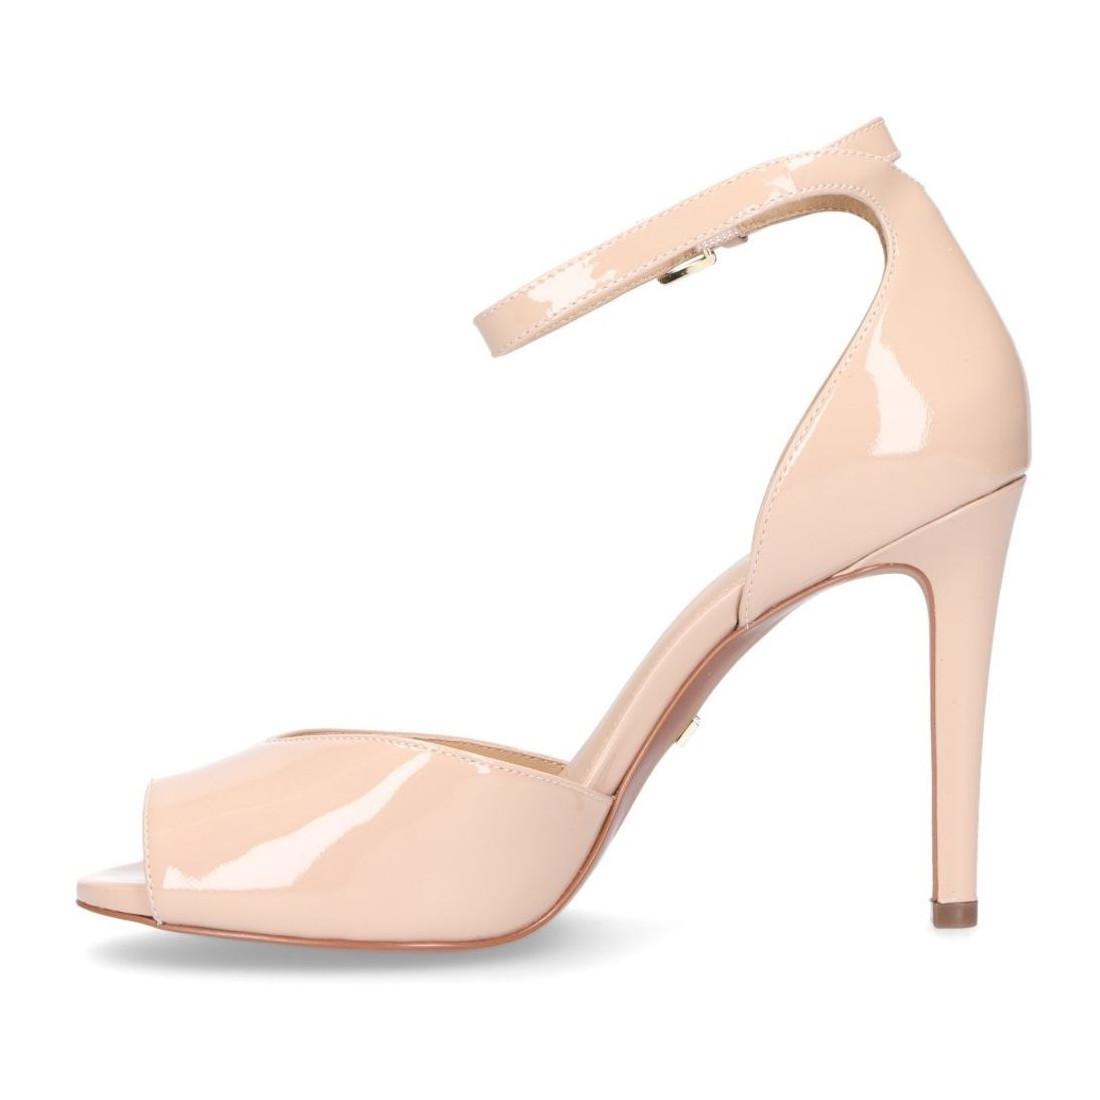 sandals woman michael kors 40s9cbha1a660 7400